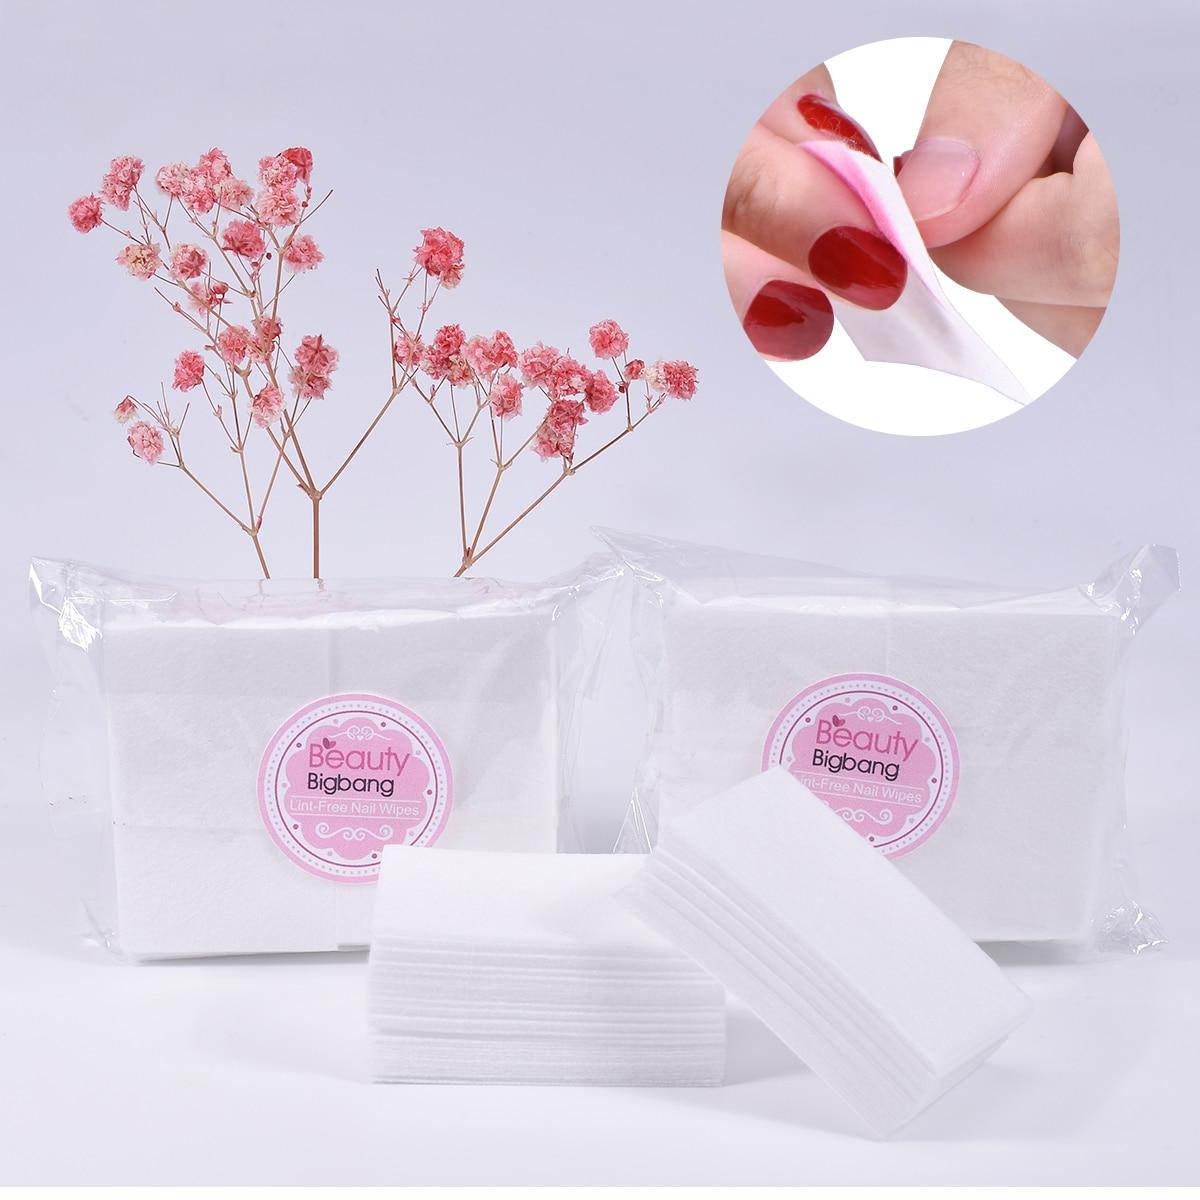 100PCS Nail Cotton Wipe Towel Nail Gel Polish Clean Removal Lint-free Wipes Soak Off Clean Gel Varnish Pad Napkins Wraps Tools